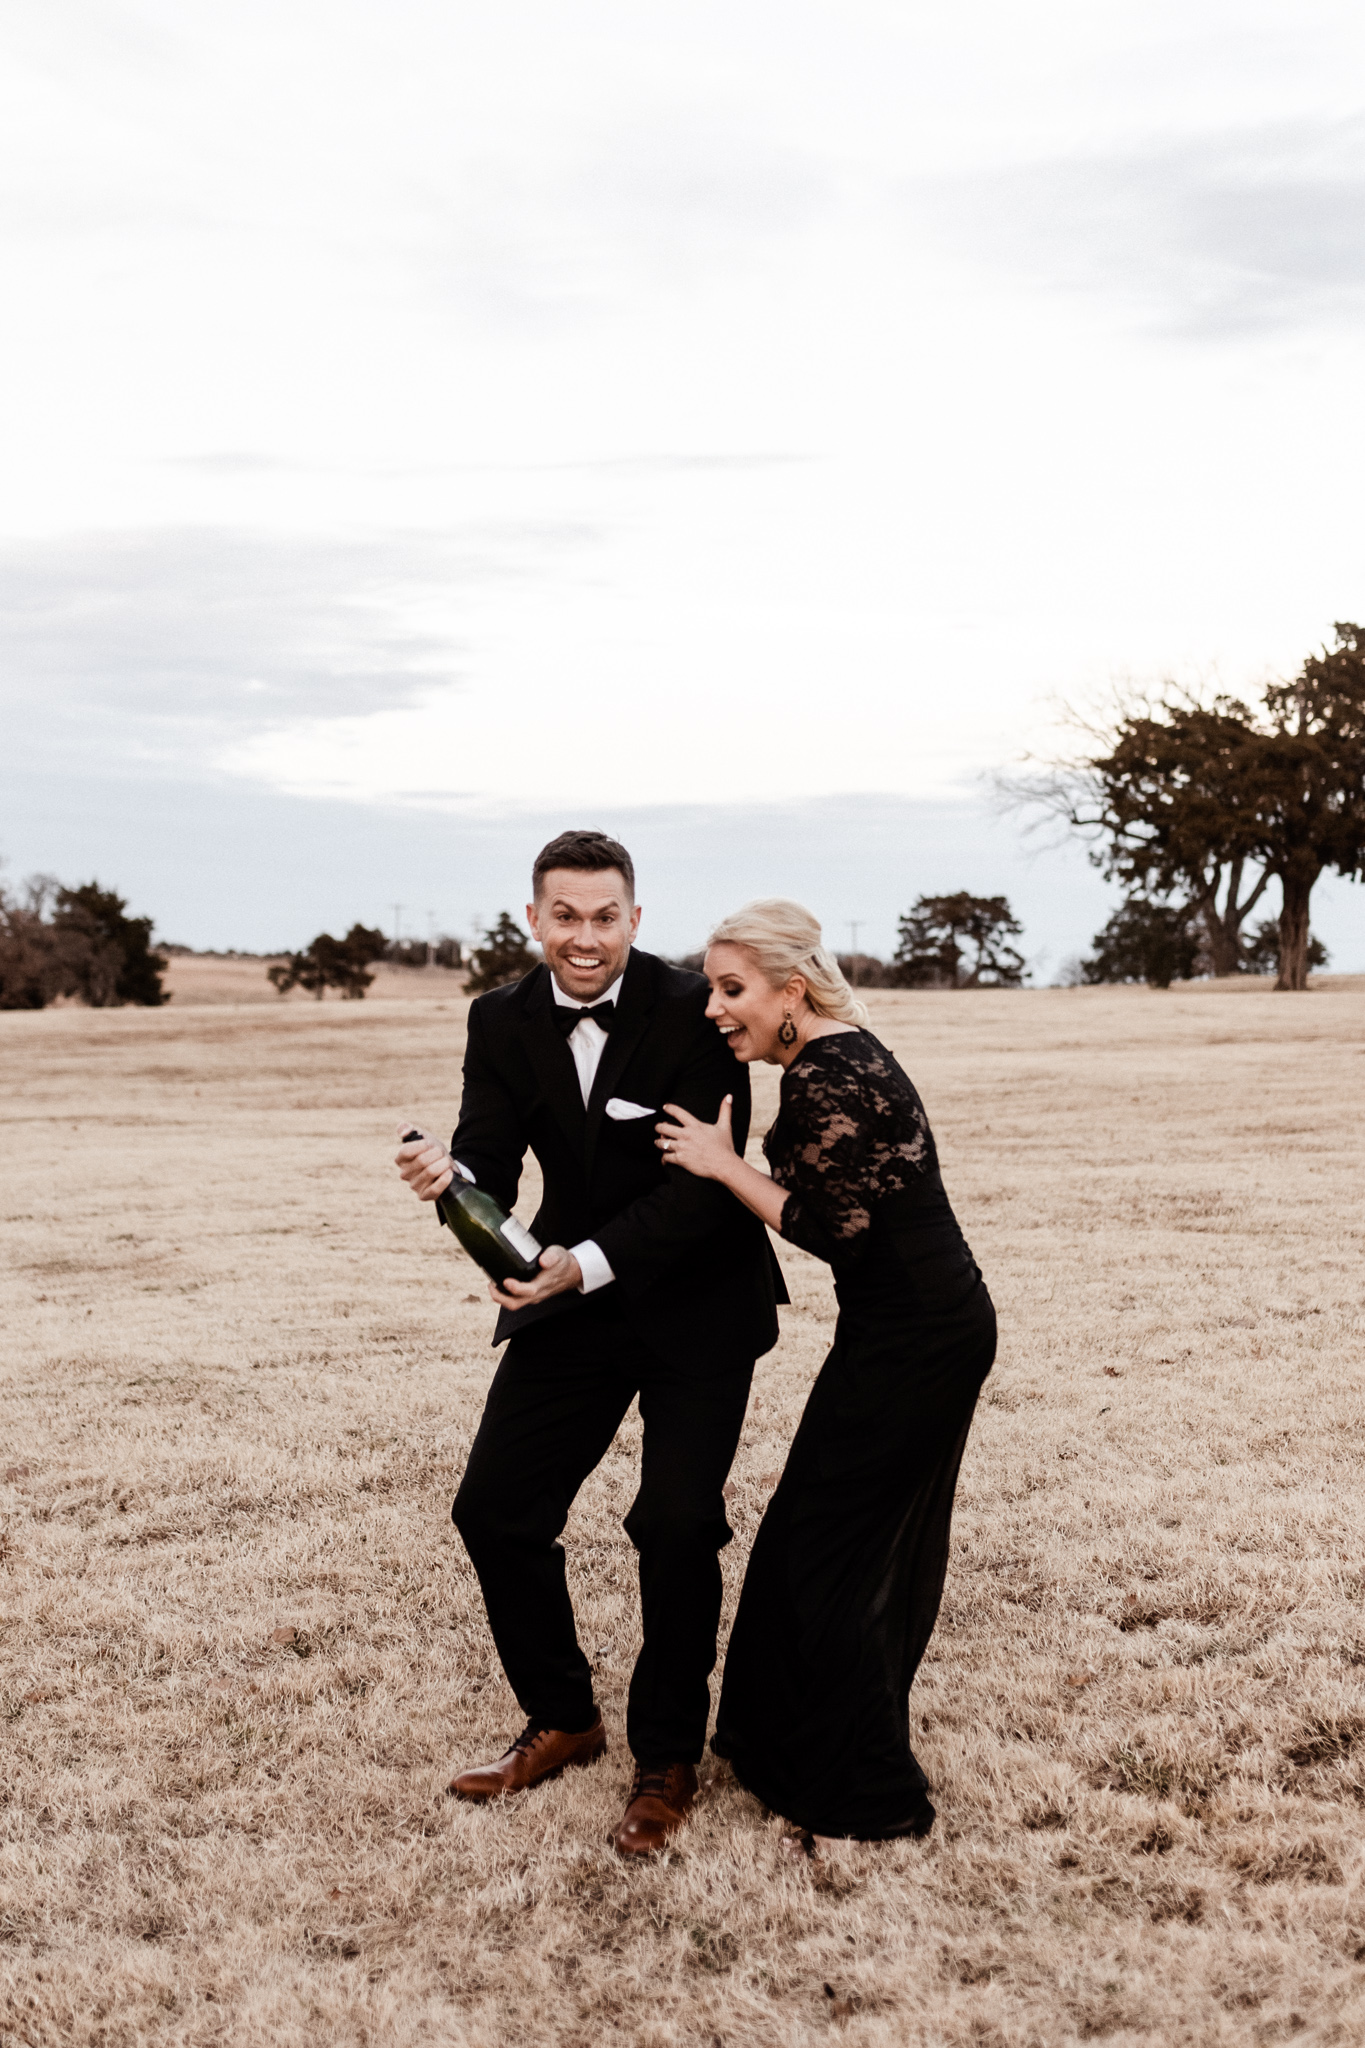 Wade + Stephanie | Warm Open Field Engagements | Oklahoma Wedding Photographer-55.jpg